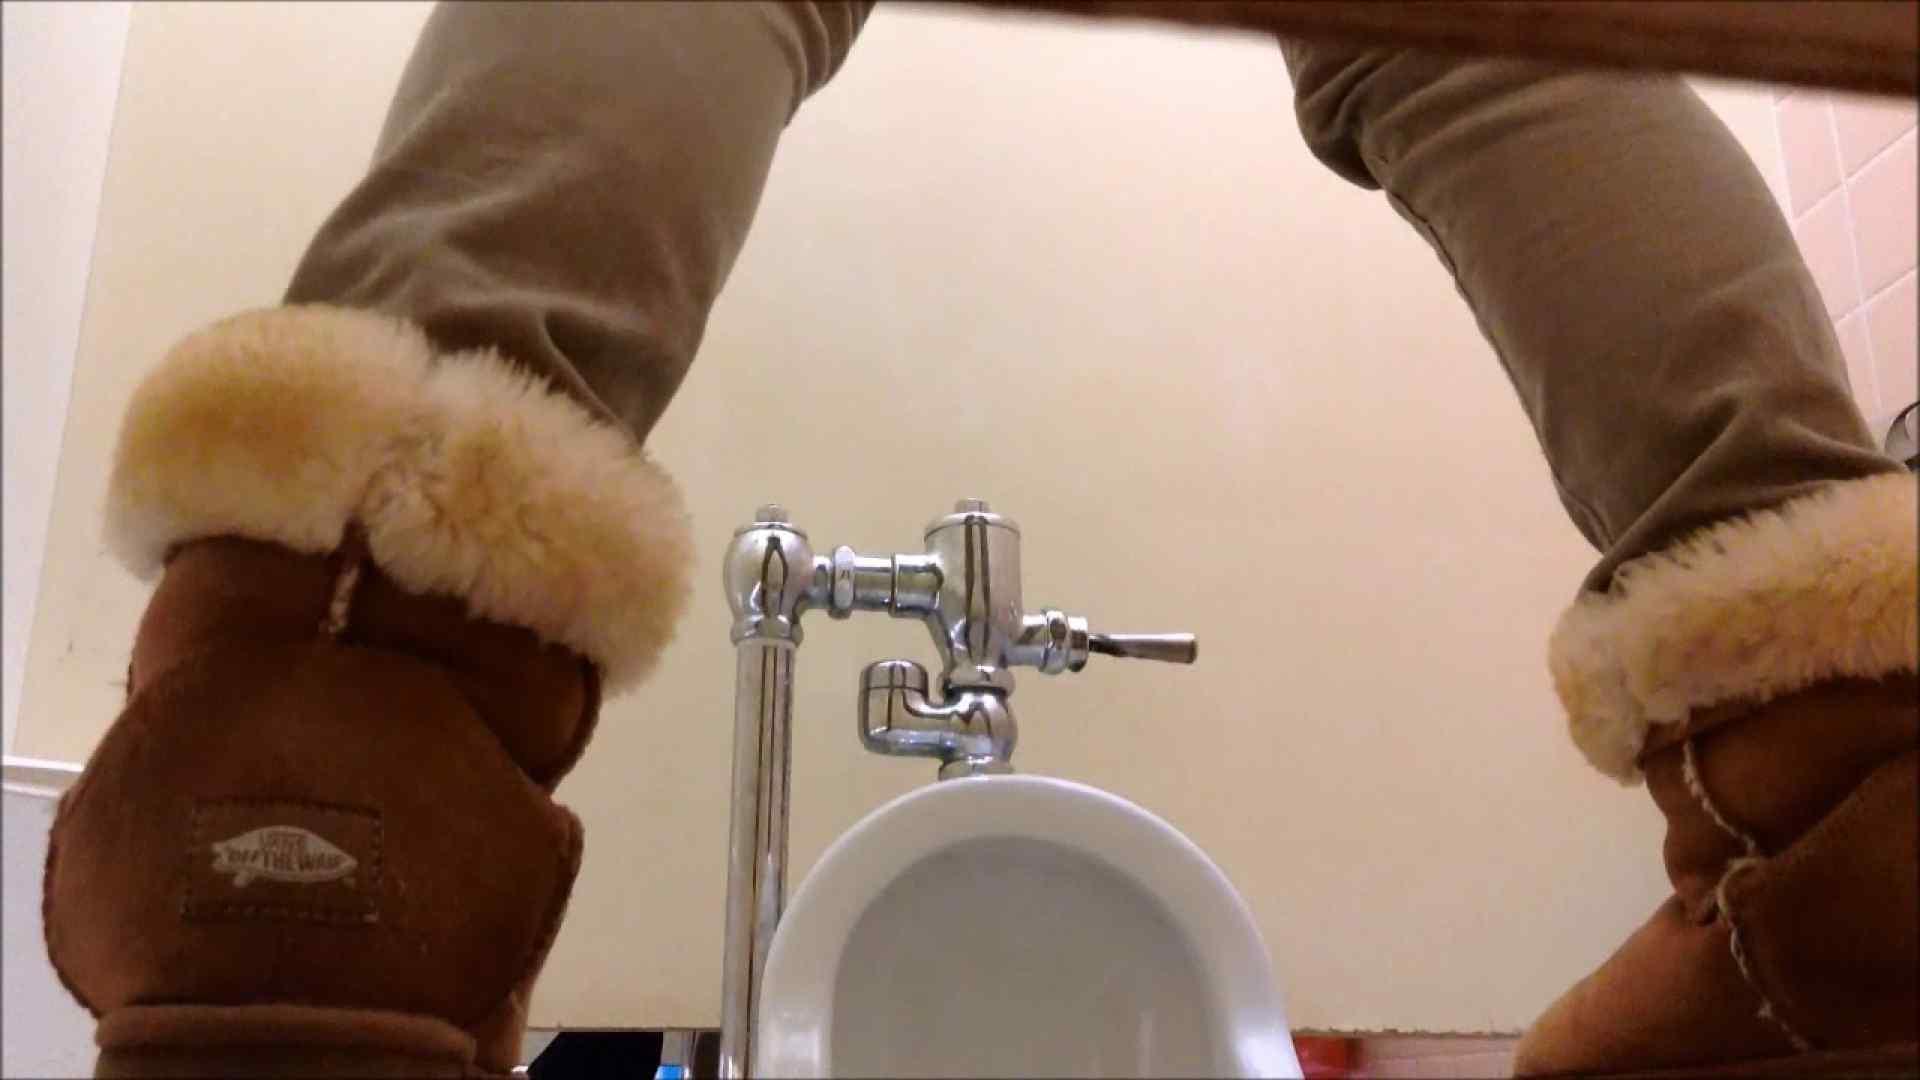 某有名大学女性洗面所 vol.06 洗面所のぞき   和式便所  111枚 73